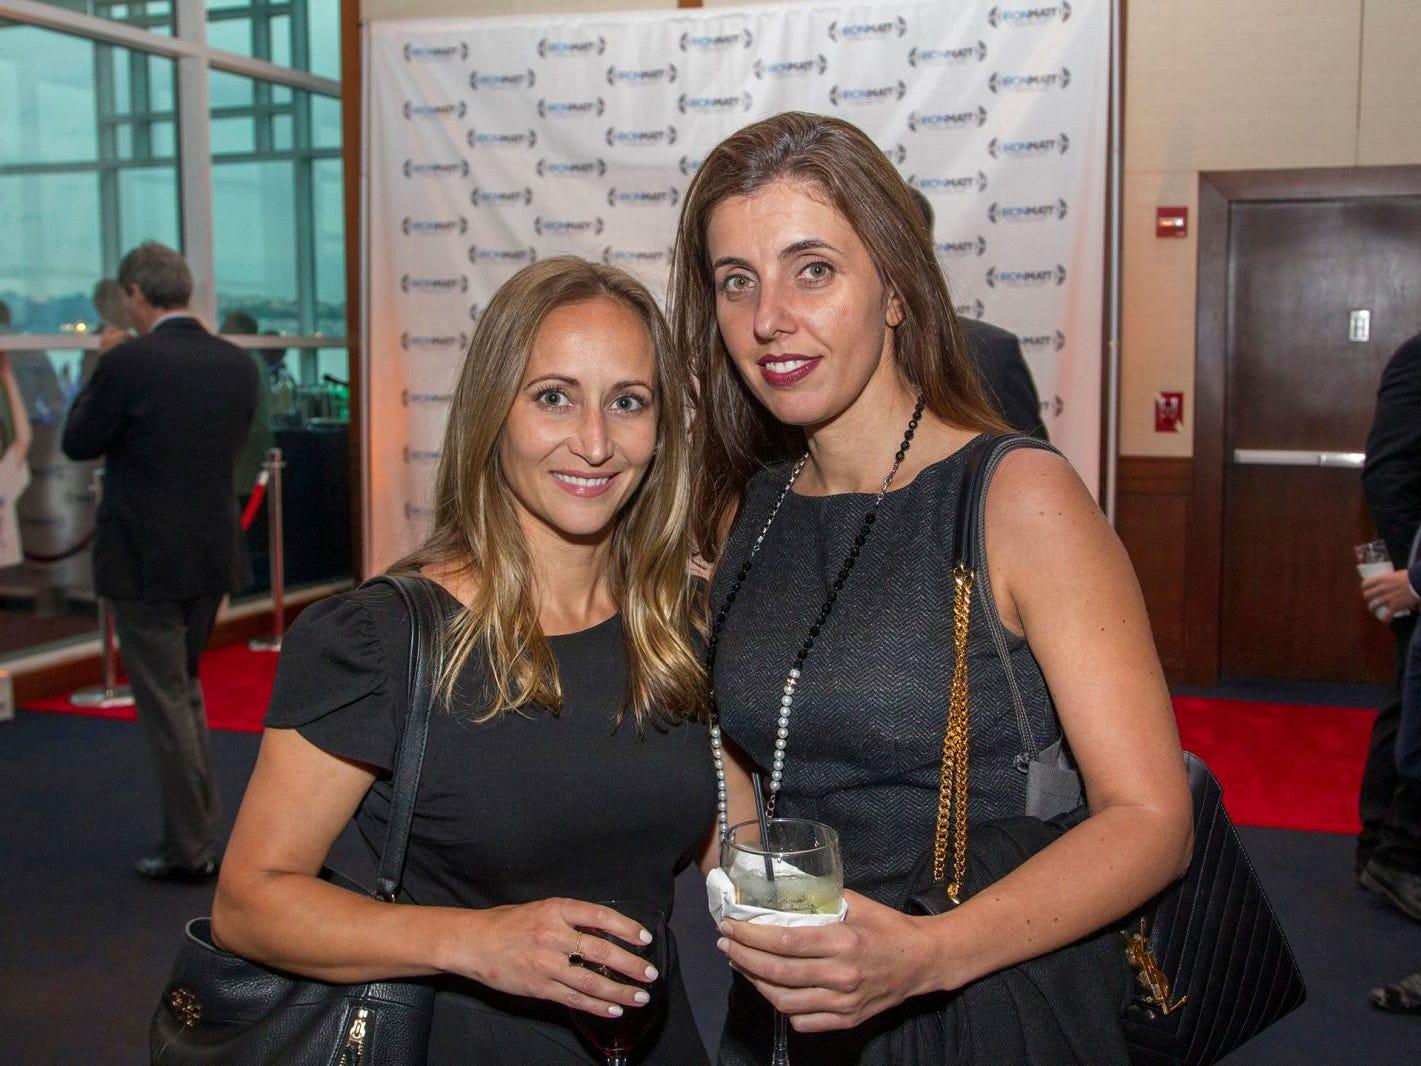 Dona Villanouva, Liz Kocovic. 11th annual IronMatt Fundraiser Gala at Pier 60 Chelsea Piers. 09/20/2018